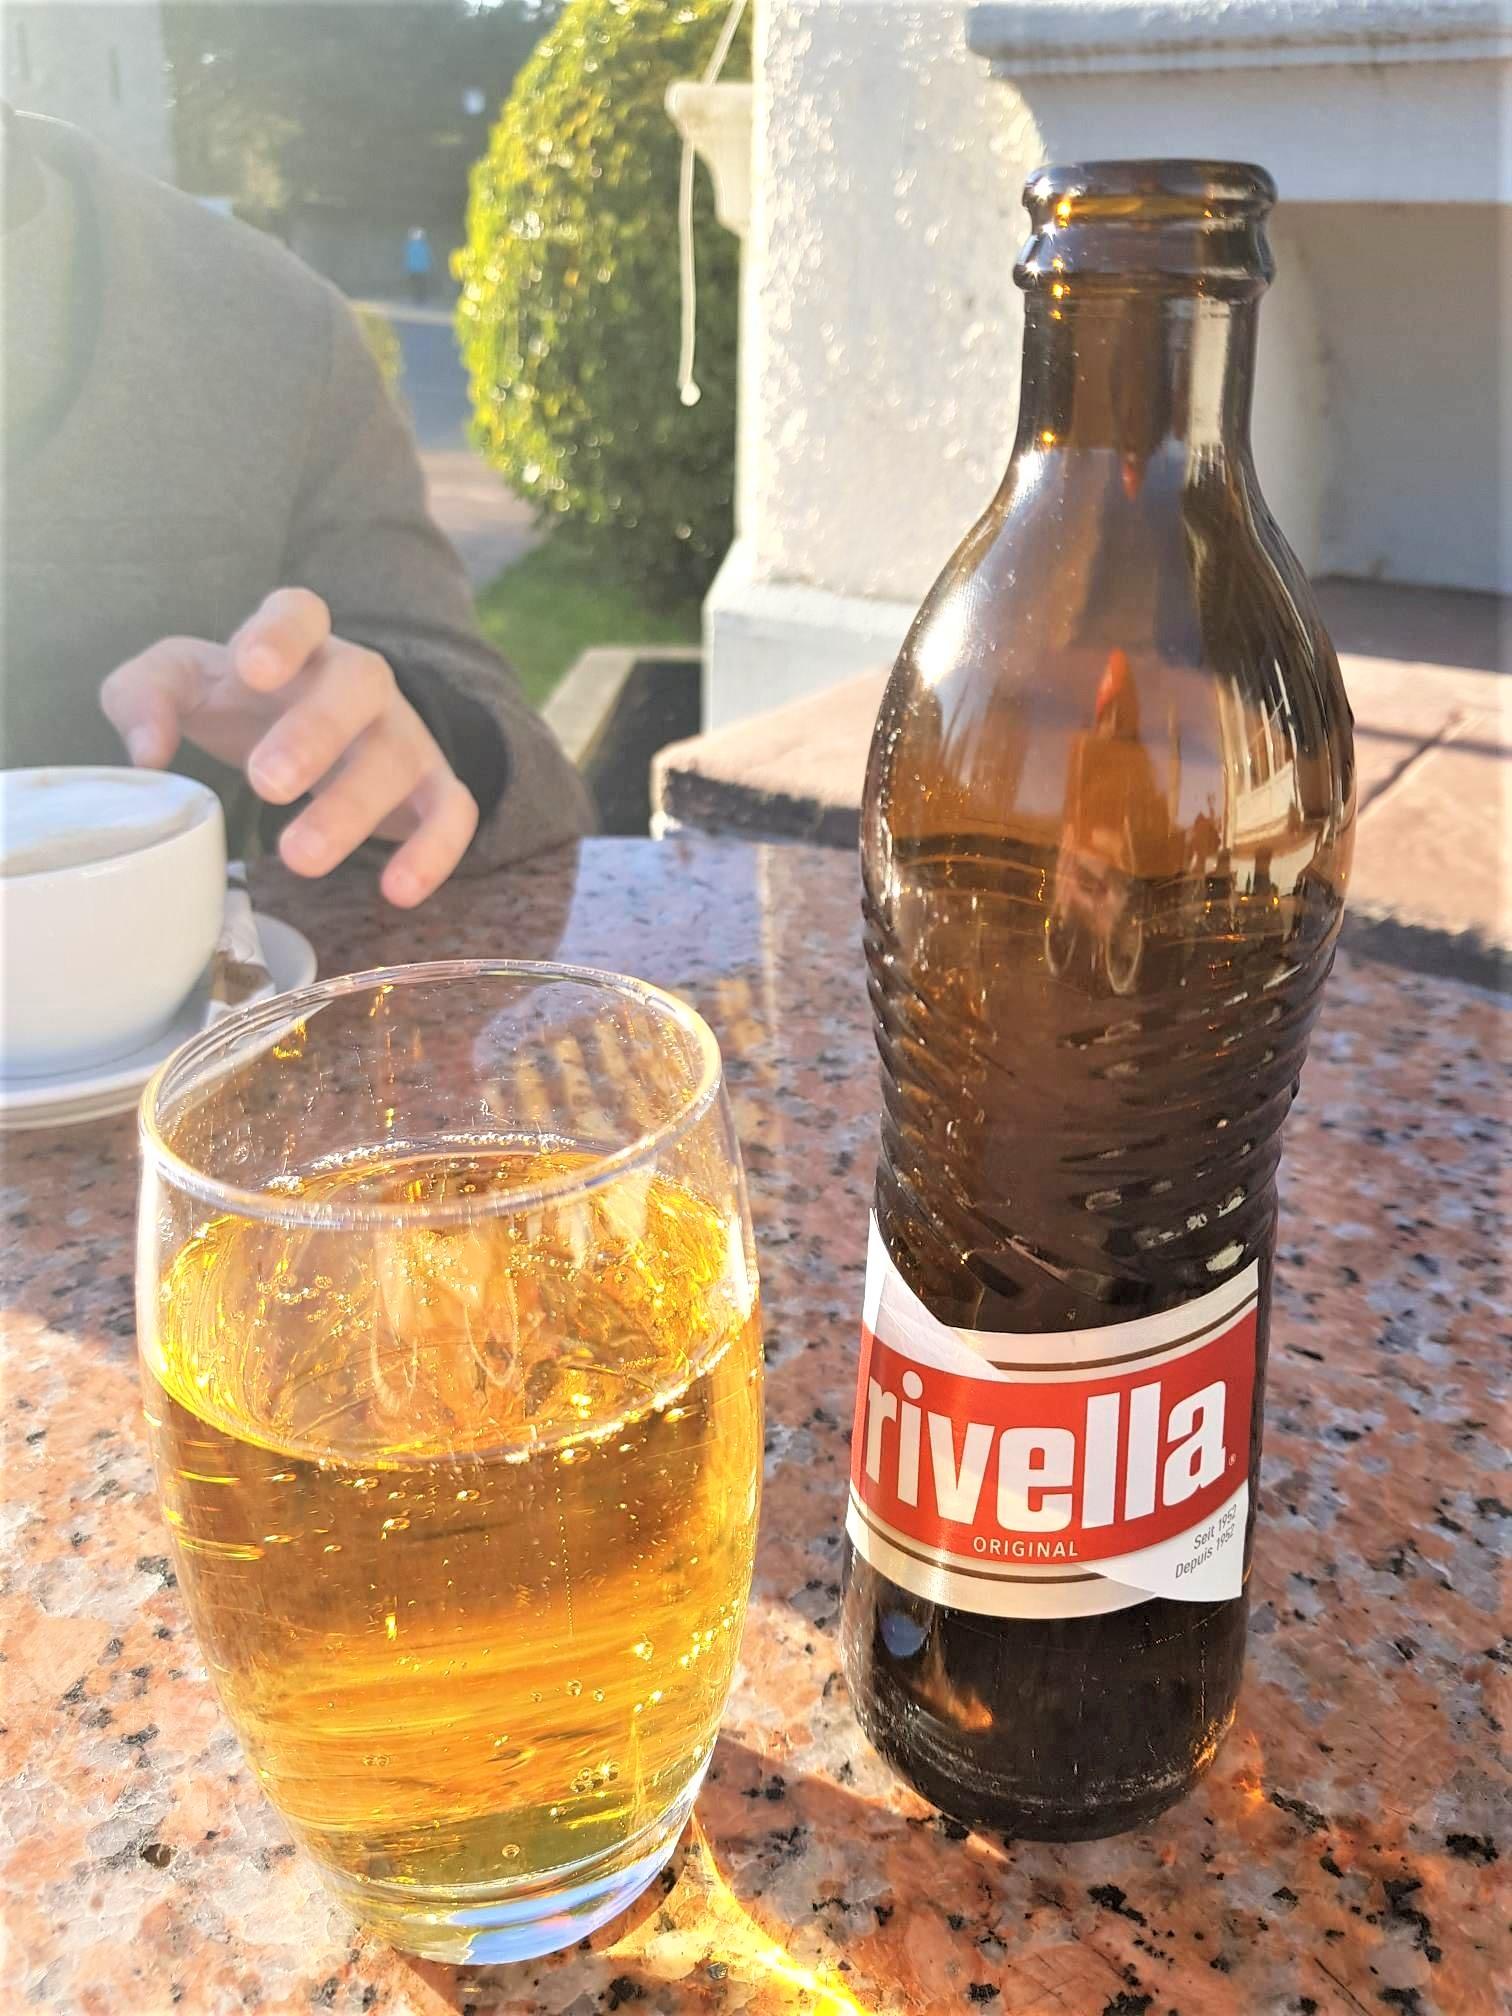 rivella-boisson-suisse-différence-france-suisse-clioandco-blog-voyage